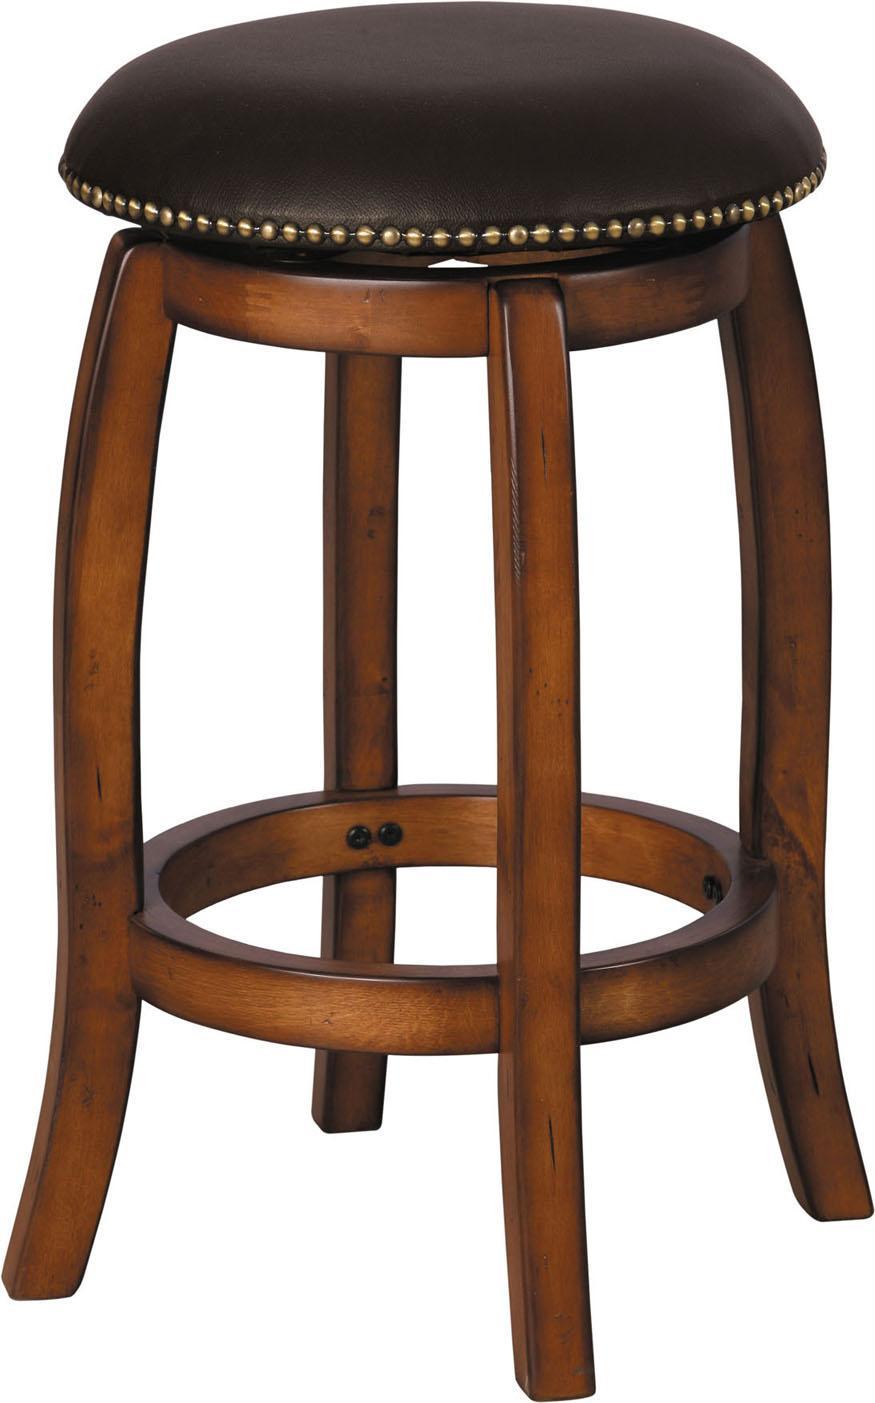 Acme Furniture Chelsea Leather Swivel Barstool - Item Number: 07249